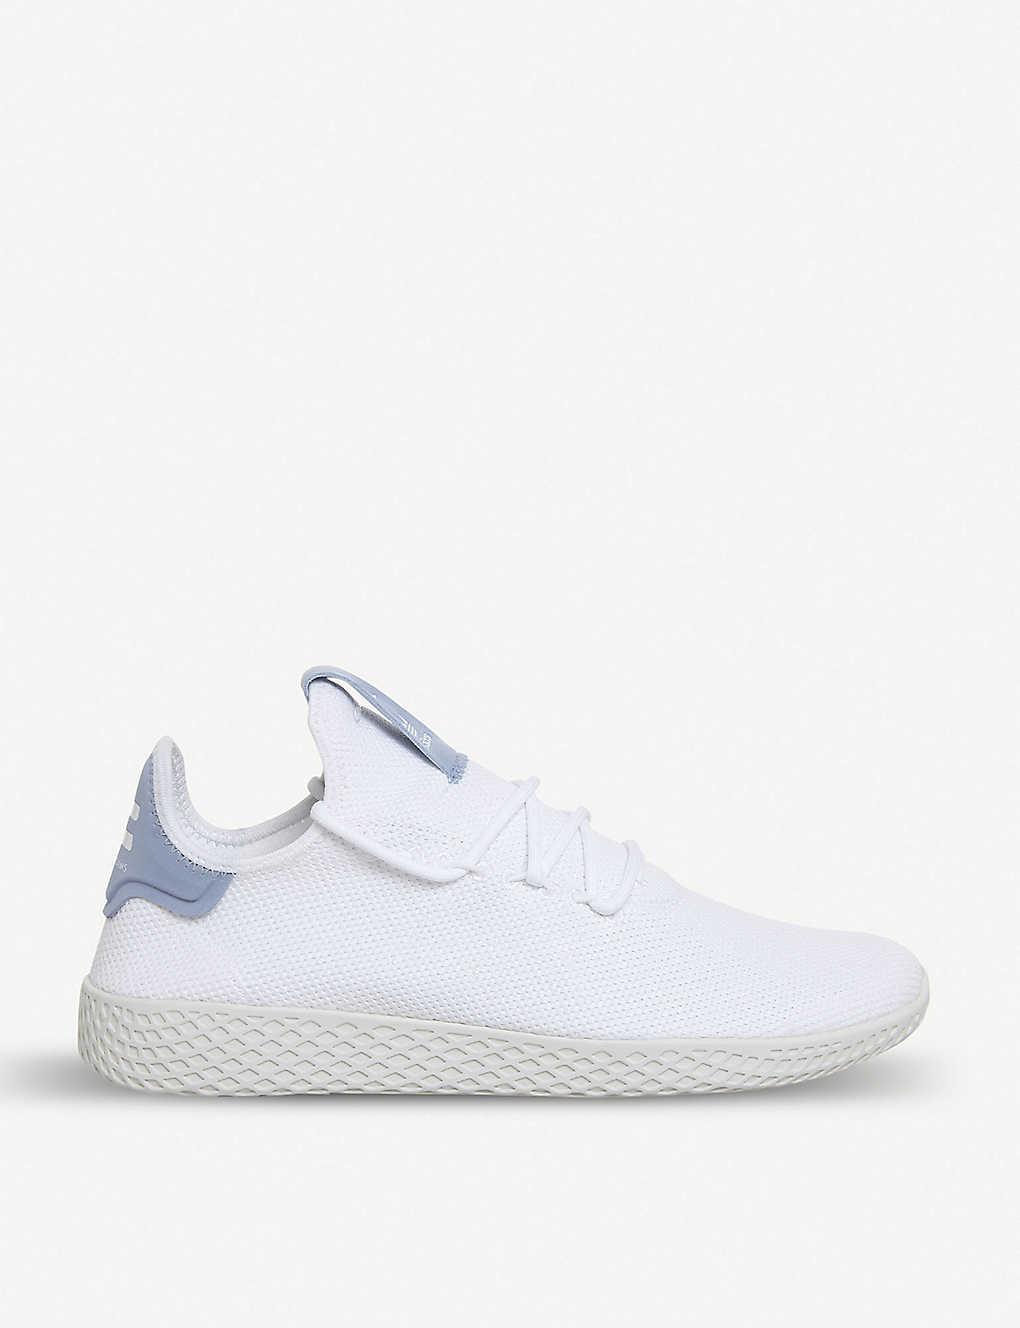 huge selection of 84589 e1070 Pharrell Williams Tennis Hu mesh trainers - White white blue ...